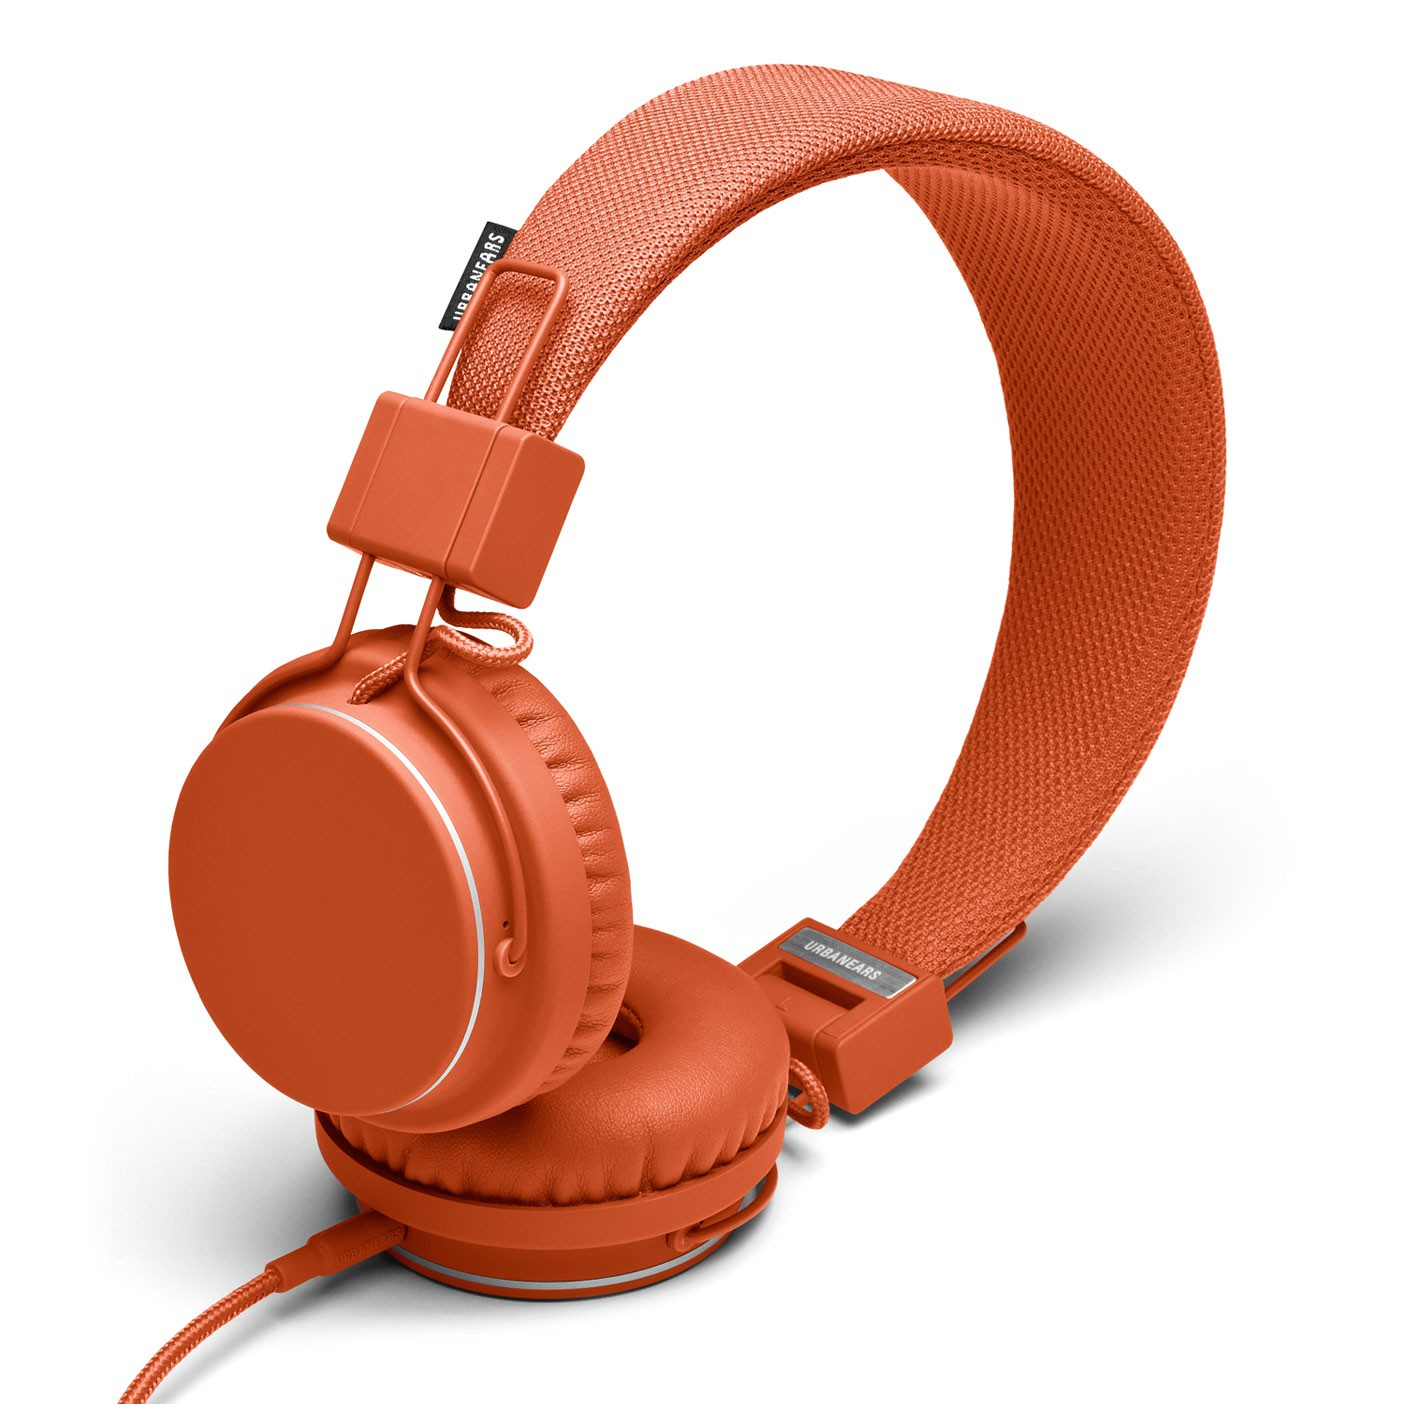 Sluchátka Urbanears Plattan rowan vel.20 Hz - 20 kHz/115 dB + doručení do 24 hodin